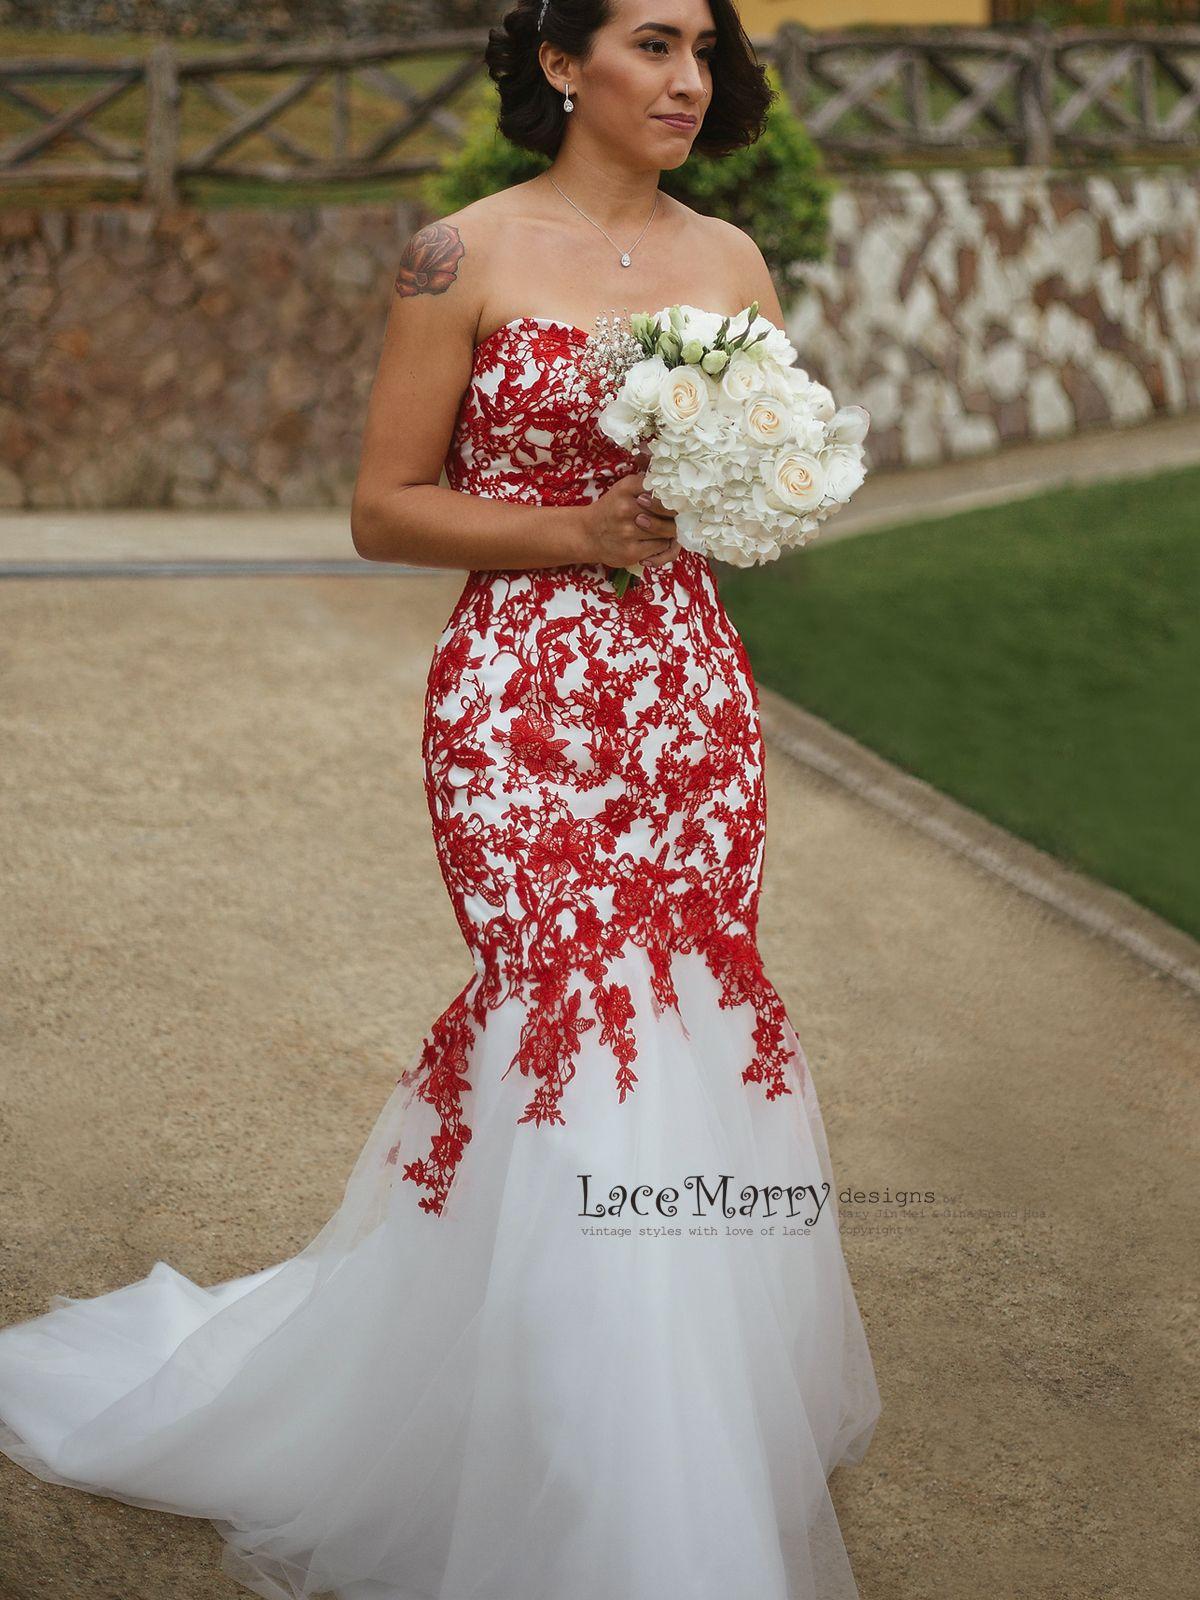 Bust Support Lace Wedding Dresses Grace Loves Lace Wedding Dresses Lace Best Wedding Dresses Wedding Dresses [ 5000 x 3333 Pixel ]